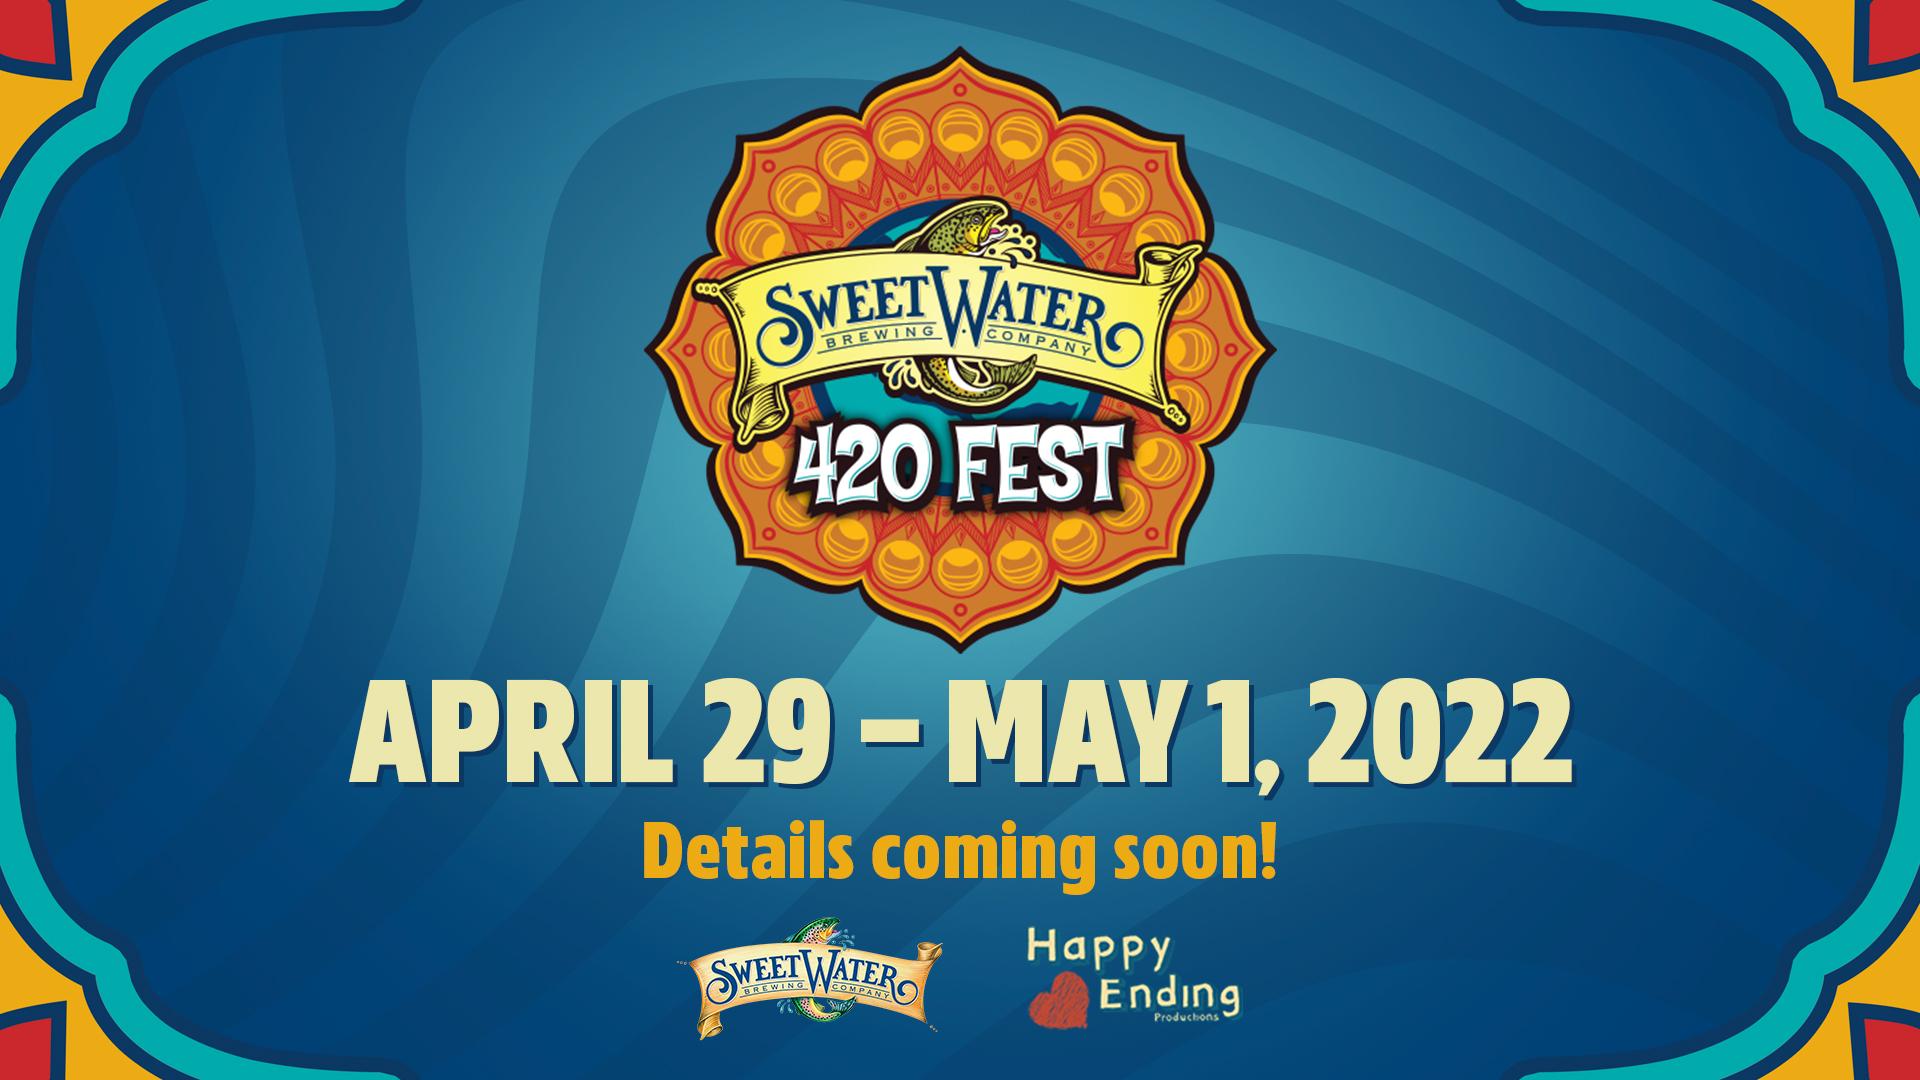 SweetWater 420 Festival Atlanta 2022